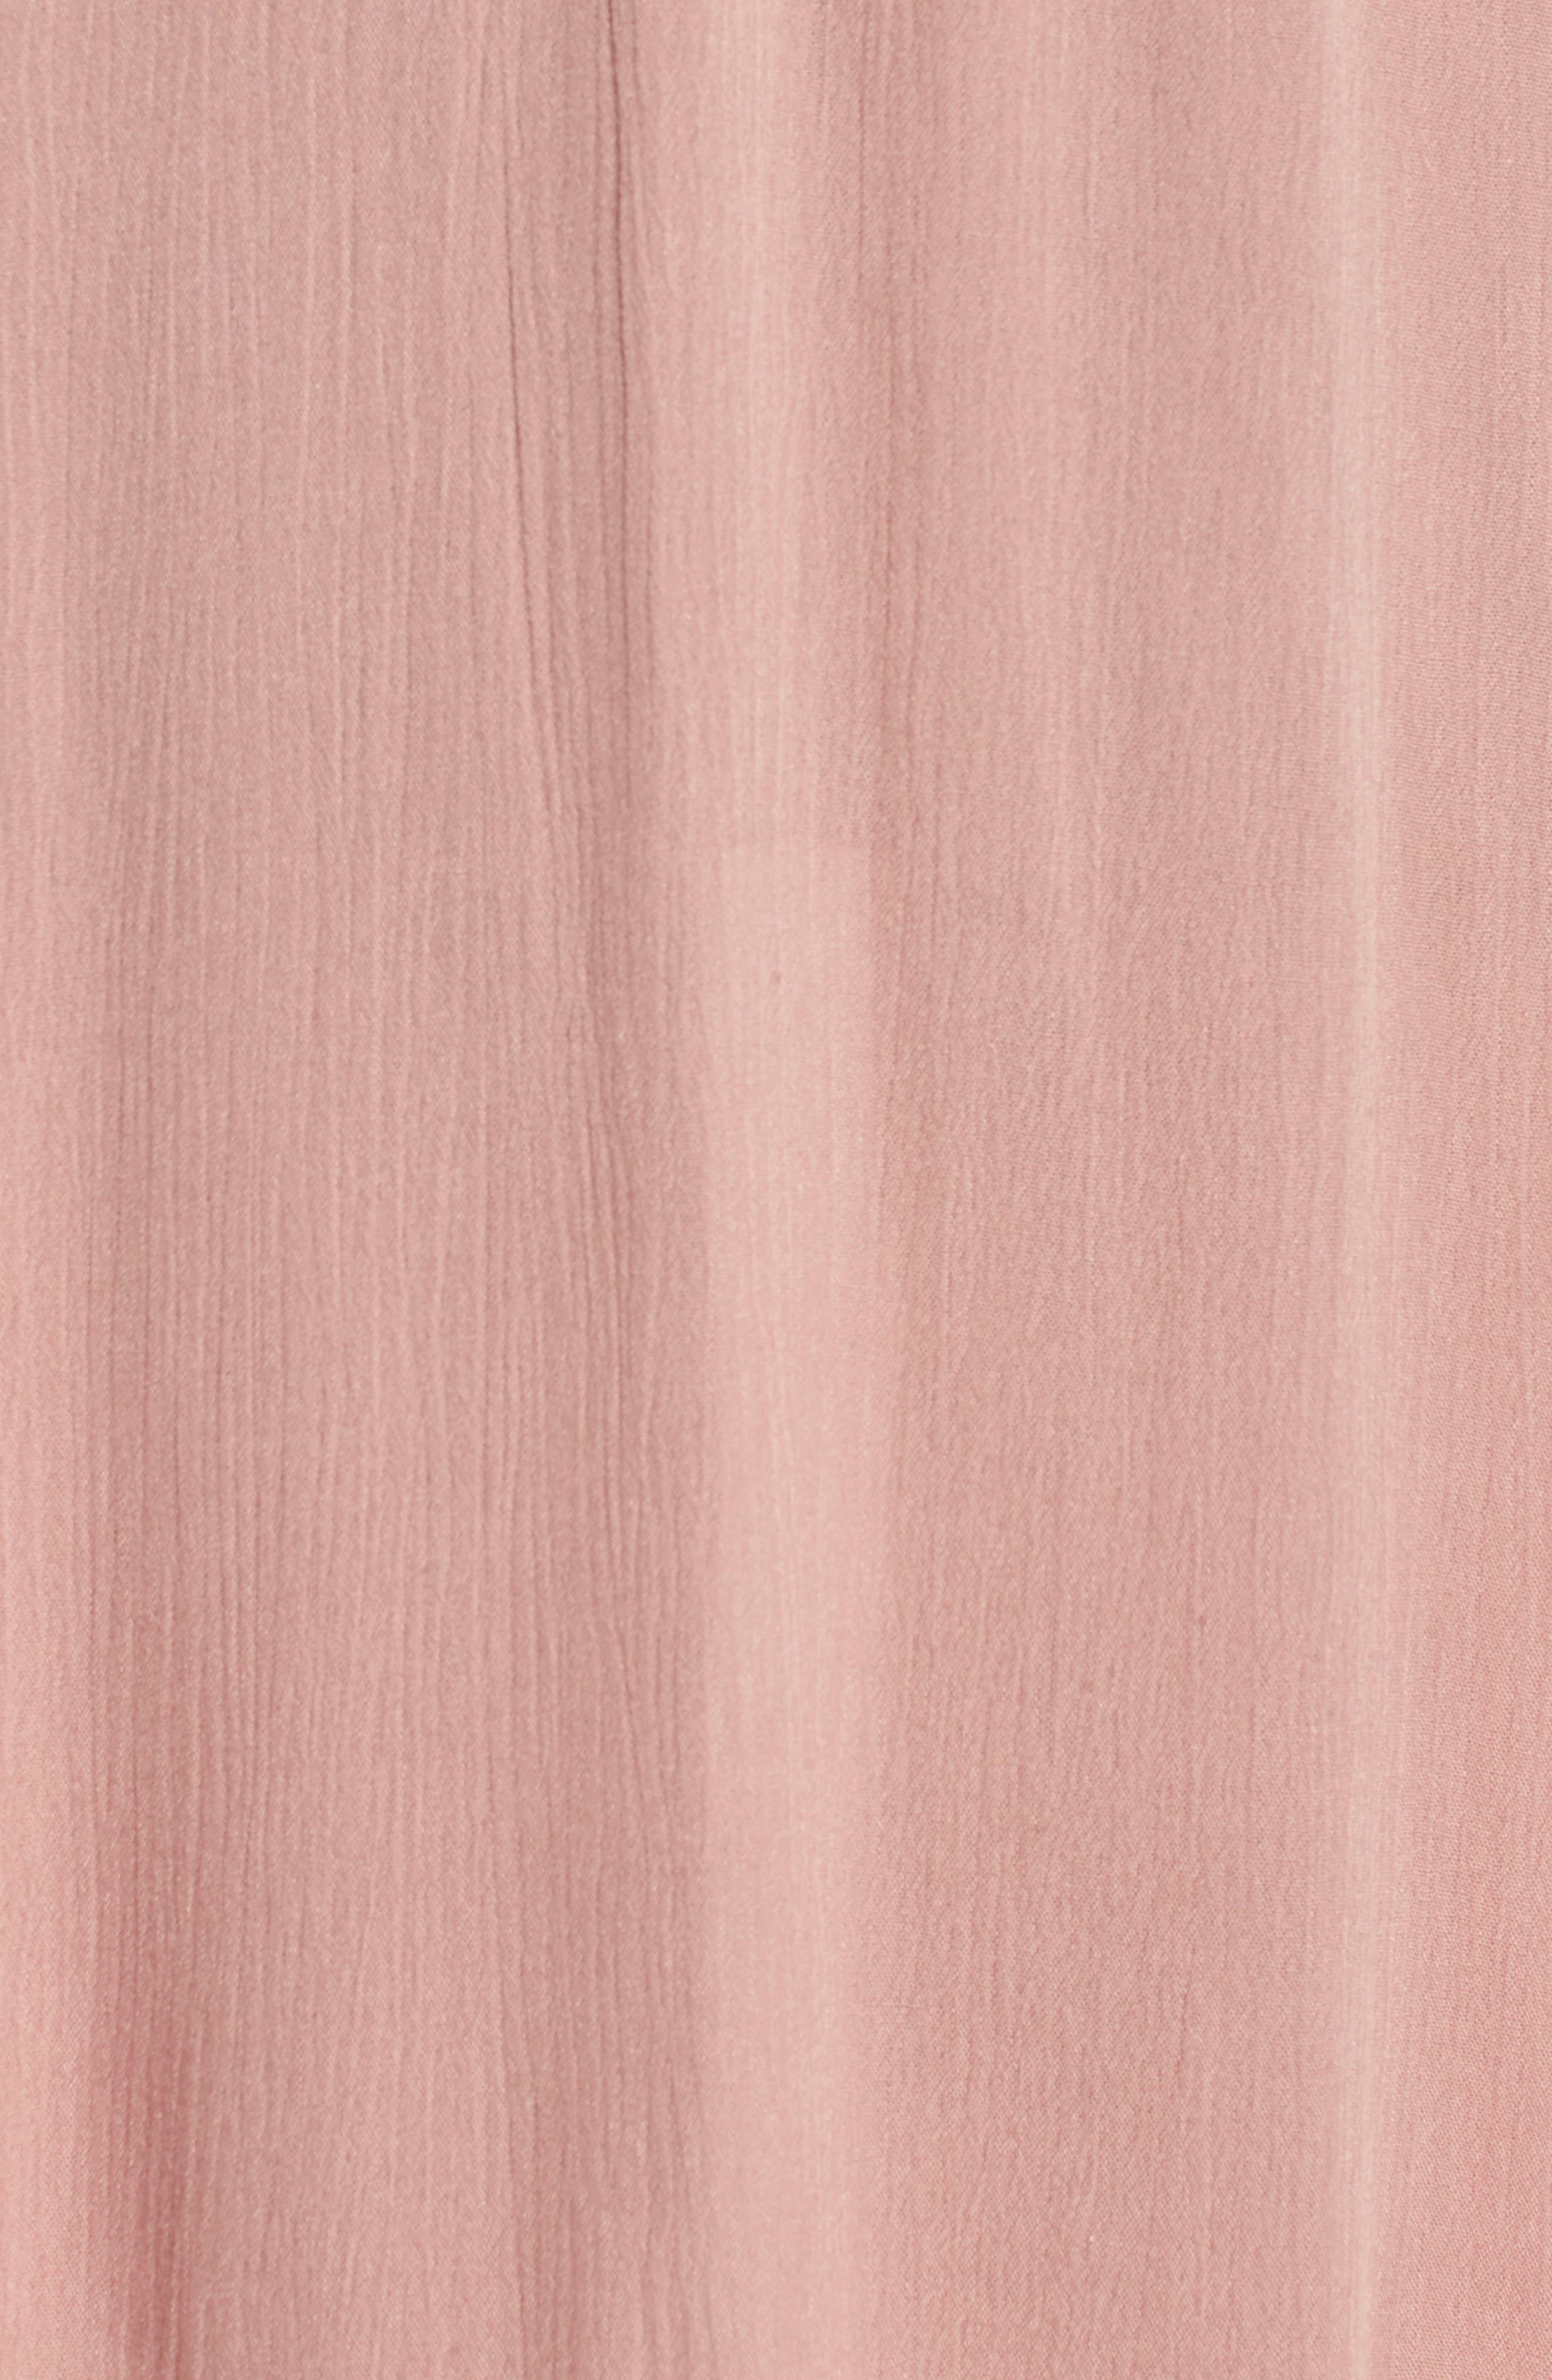 Surrey Maxi Dress,                             Alternate thumbnail 3, color,                             Nude Rose